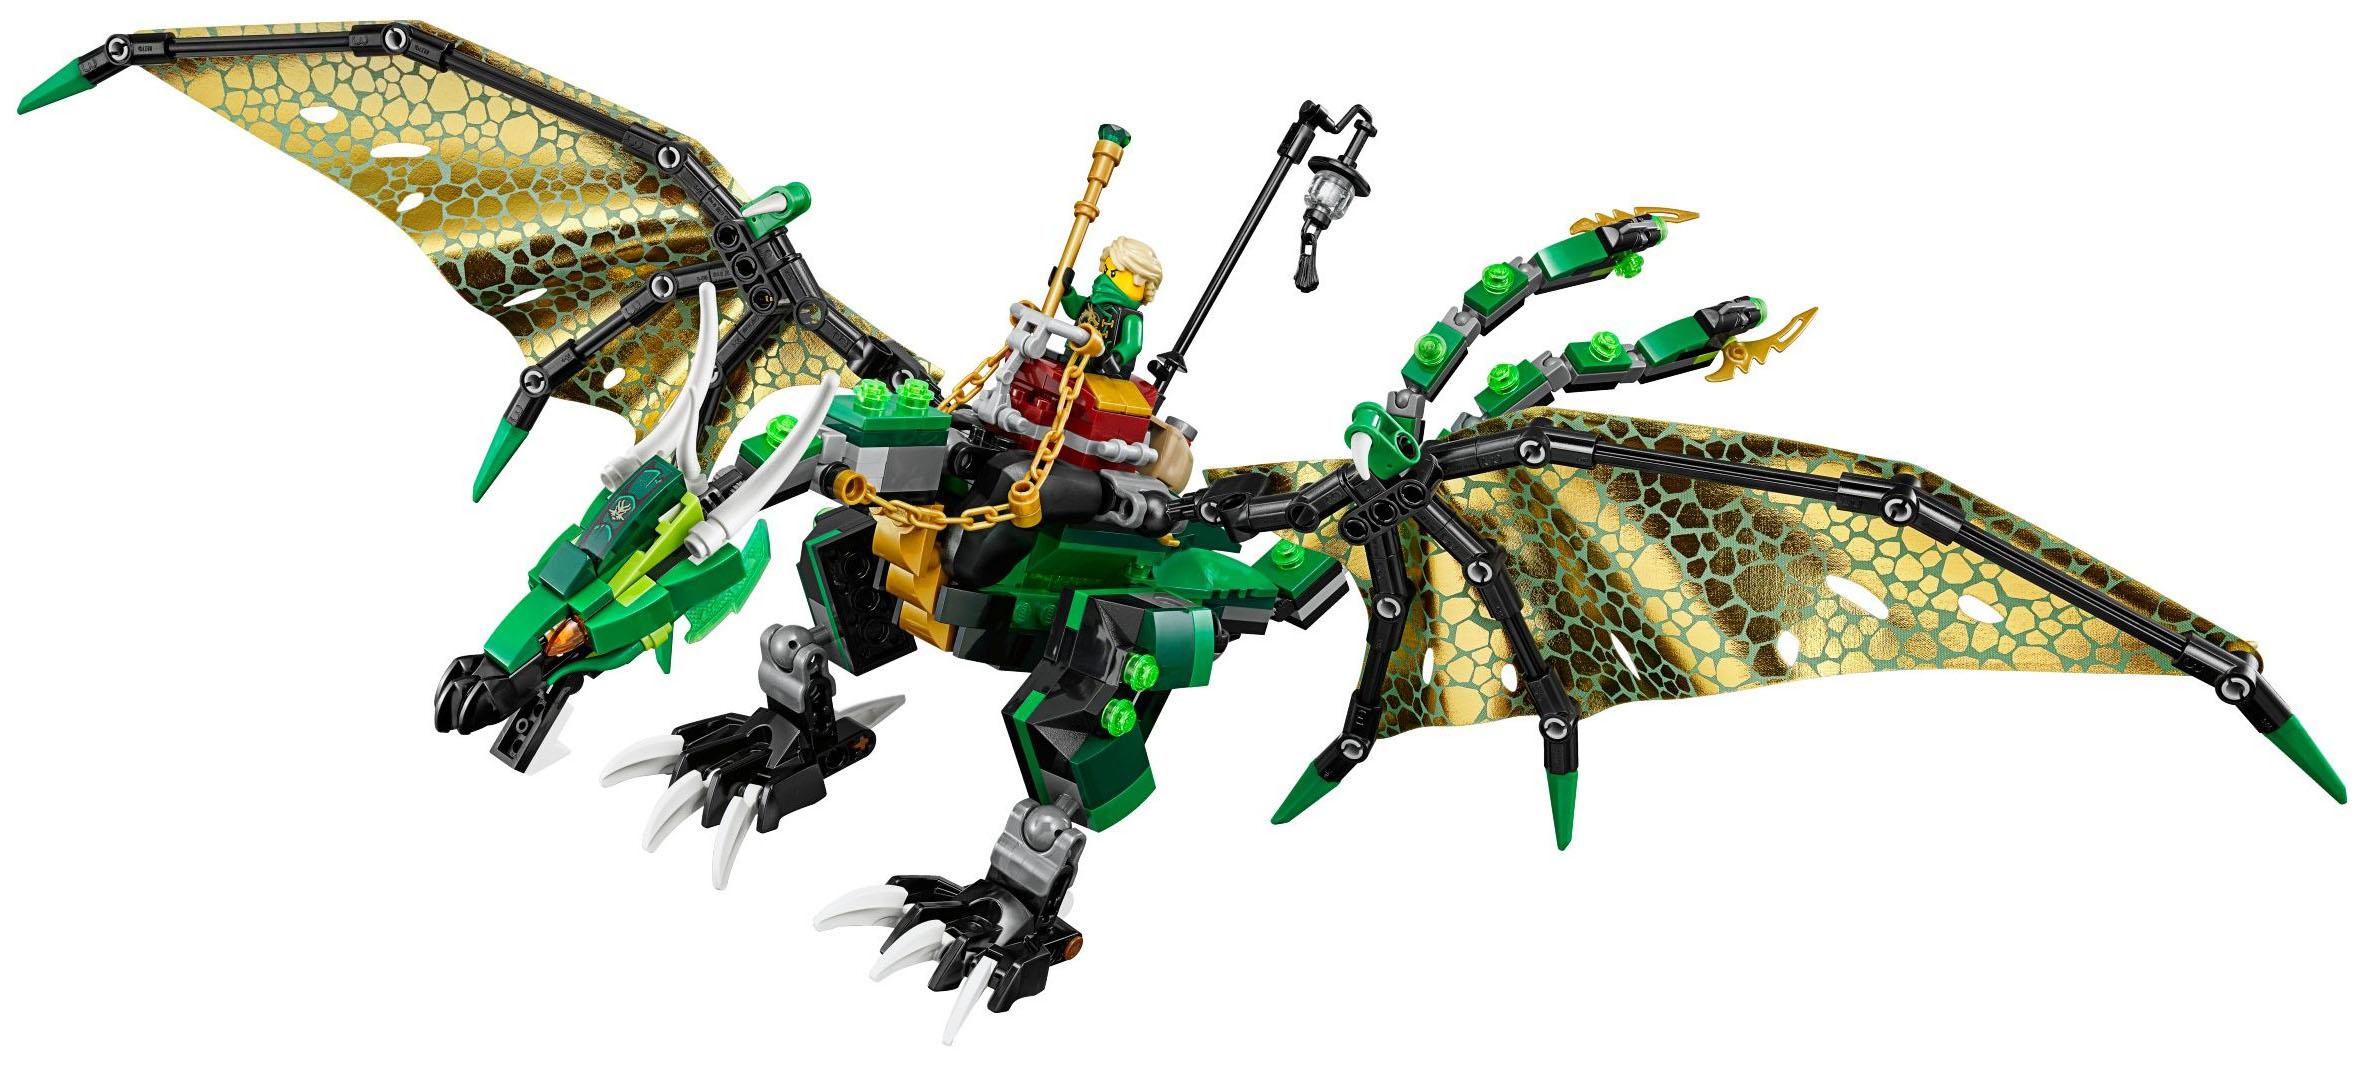 lego ninjago 70593 pas cher le dragon meraude de lloyd. Black Bedroom Furniture Sets. Home Design Ideas